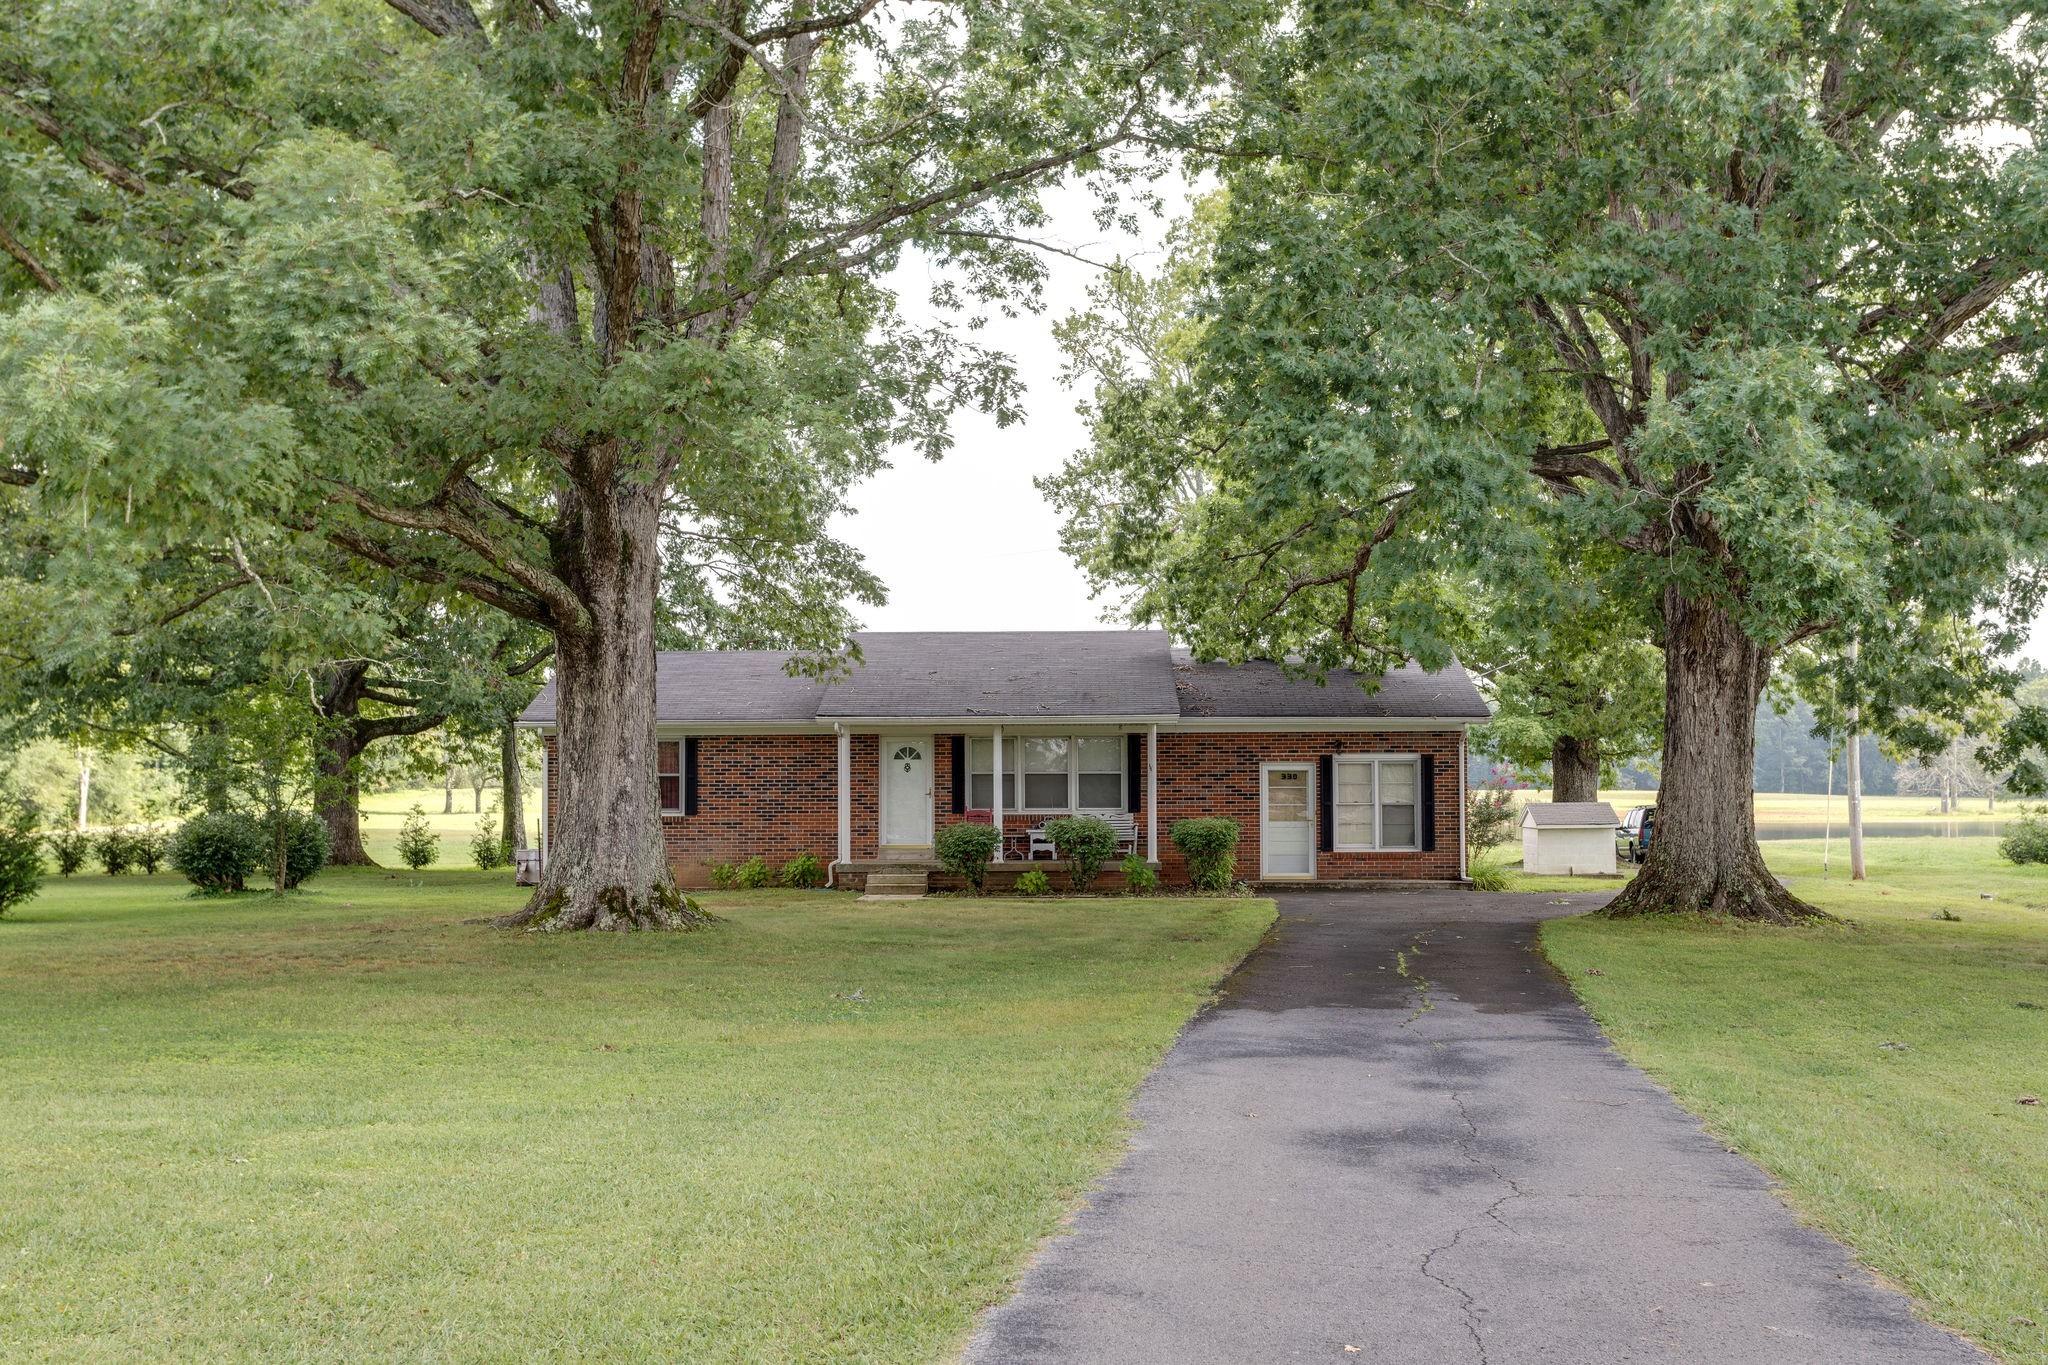 330 Ledford Mill Rd Property Photo - Tullahoma, TN real estate listing